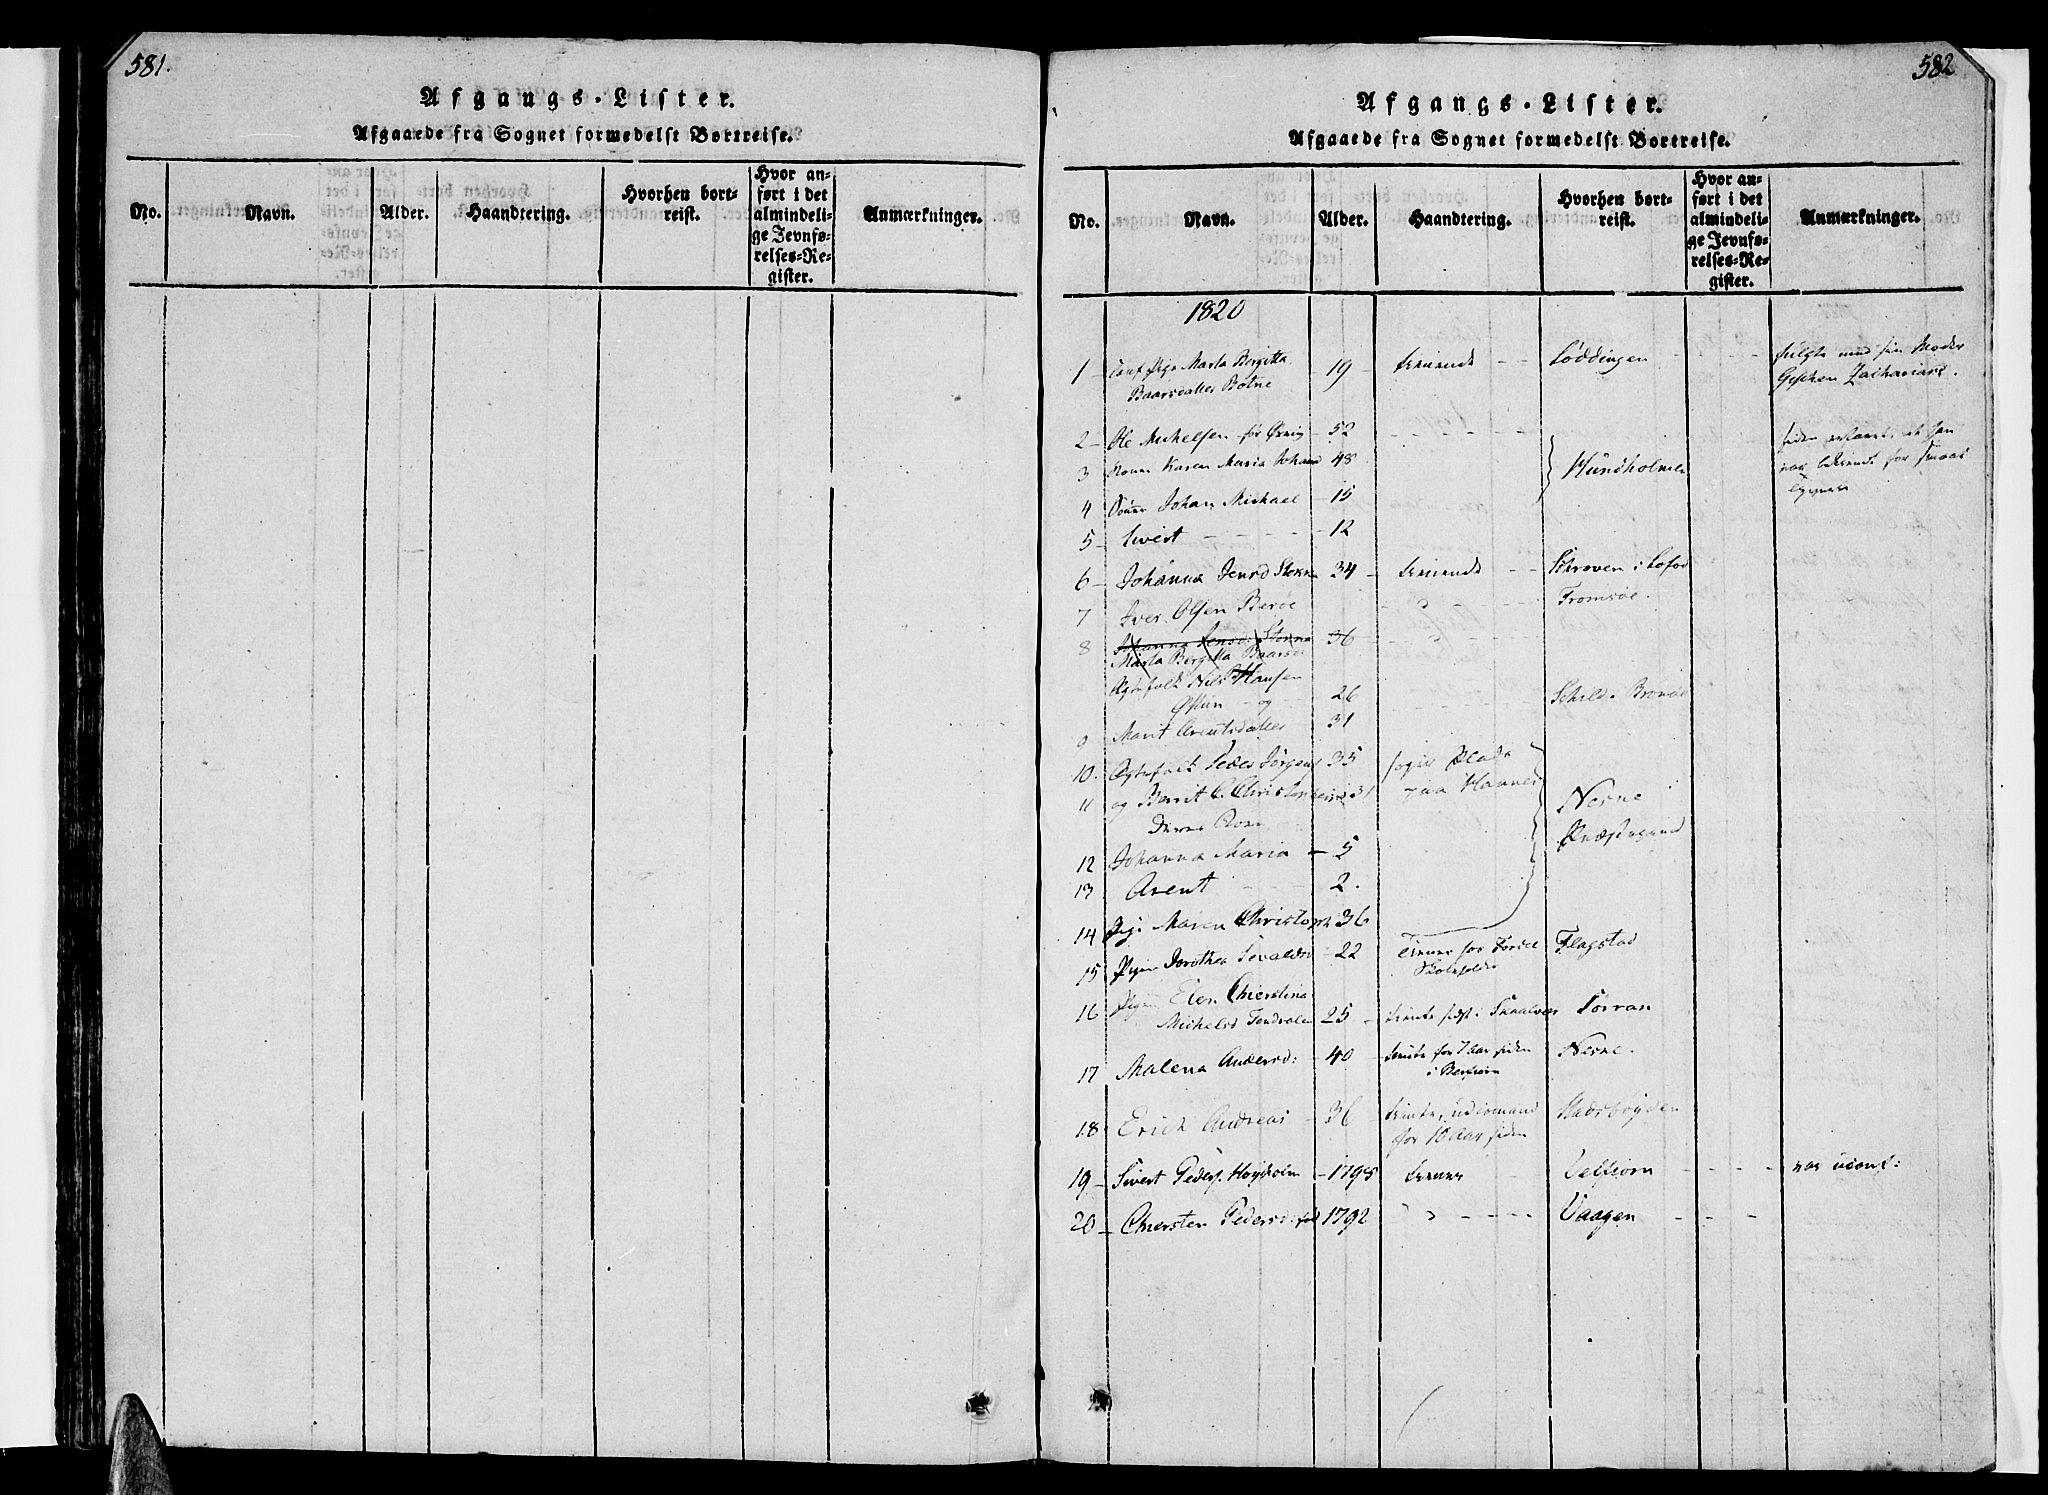 SAT, Ministerialprotokoller, klokkerbøker og fødselsregistre - Nordland, 830/L0445: Ministerialbok nr. 830A09, 1820-1830, s. 581-582